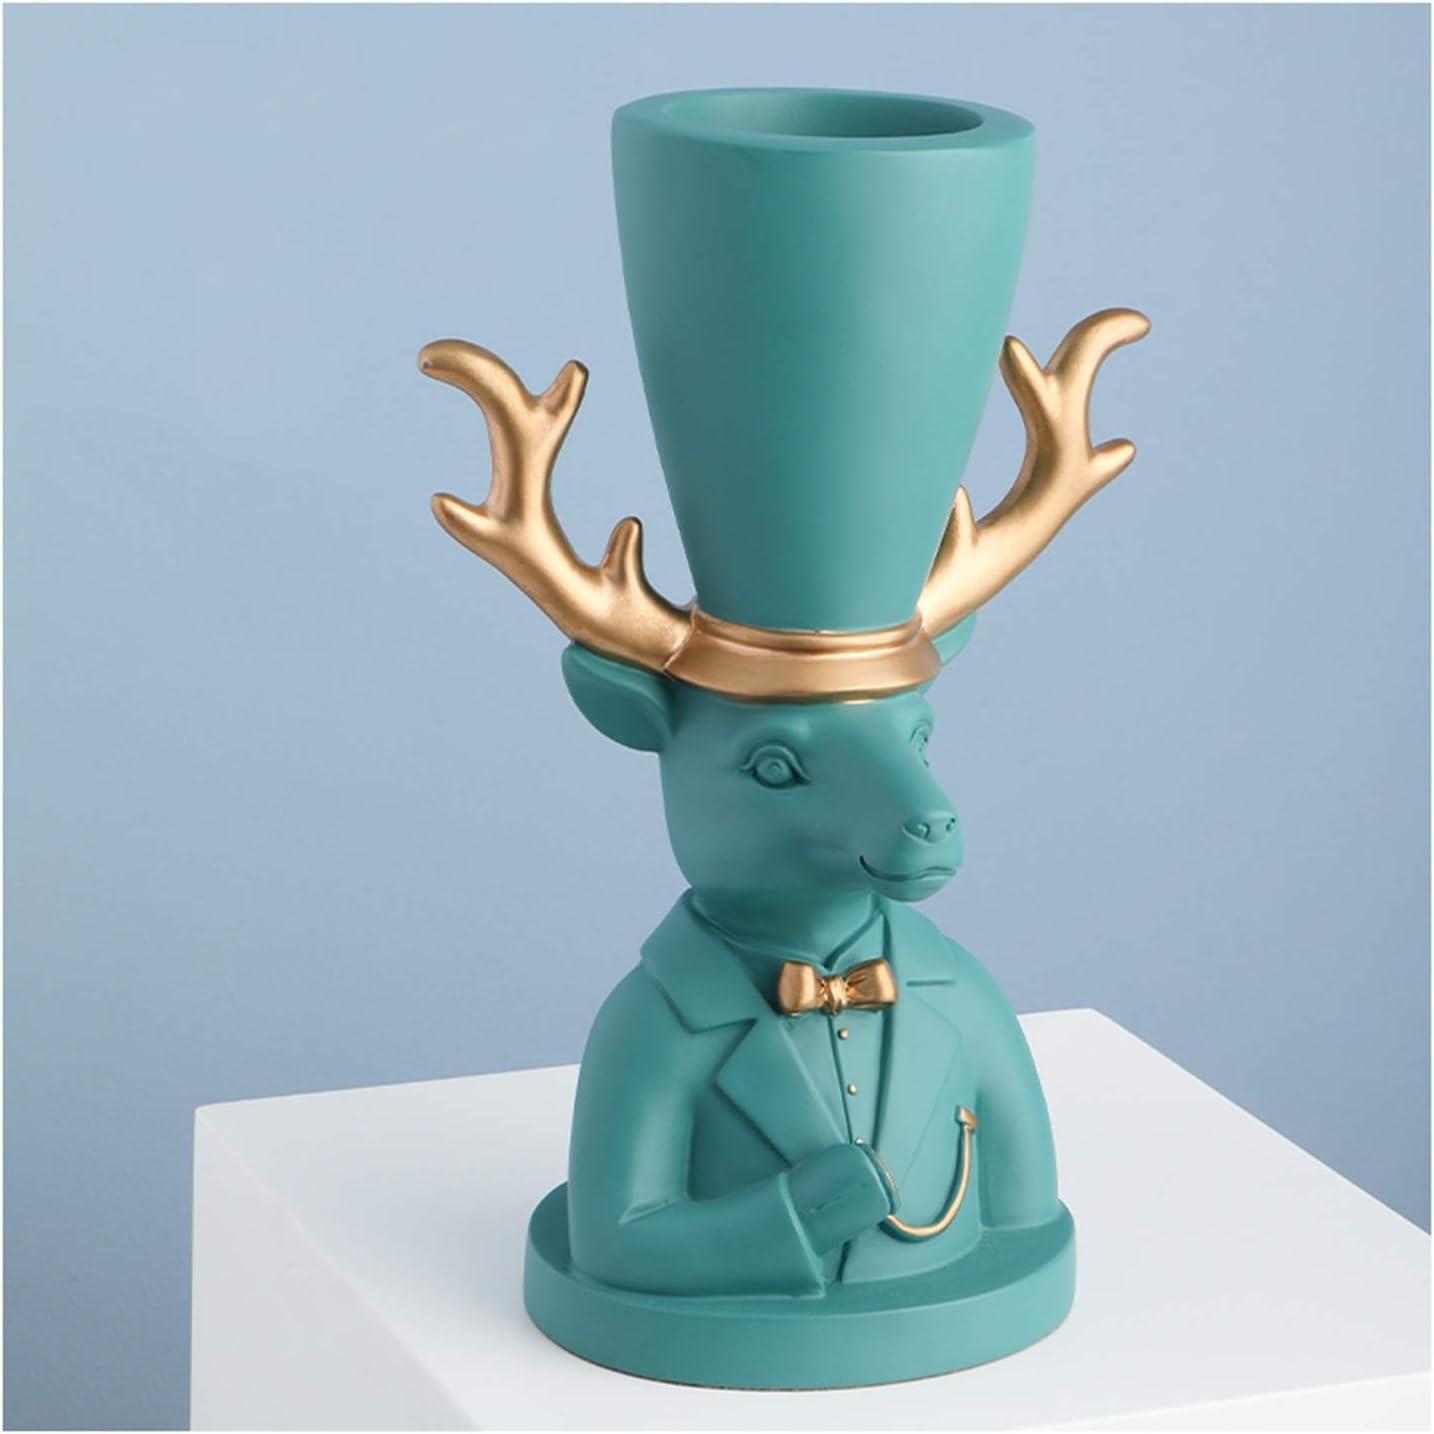 alyf Desk Ornaments Resin Miami Mall Deer Makeup It is very popular Sculpture Brush